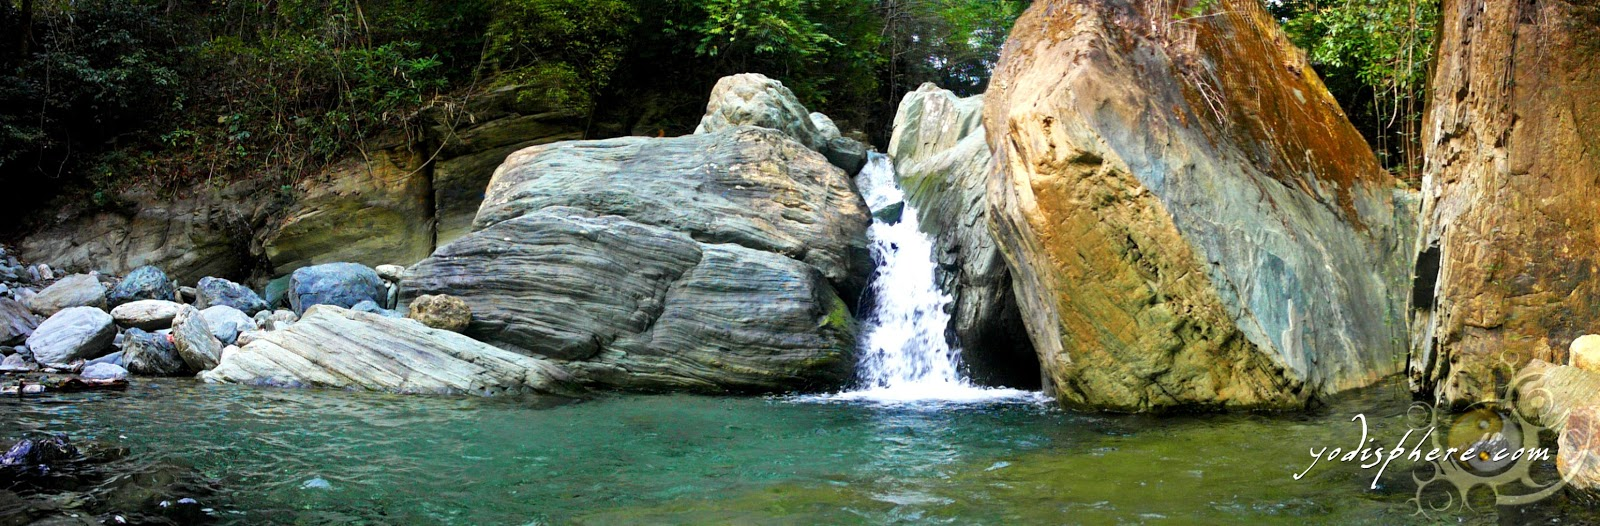 Panoramic View of Calawagan river mini falls